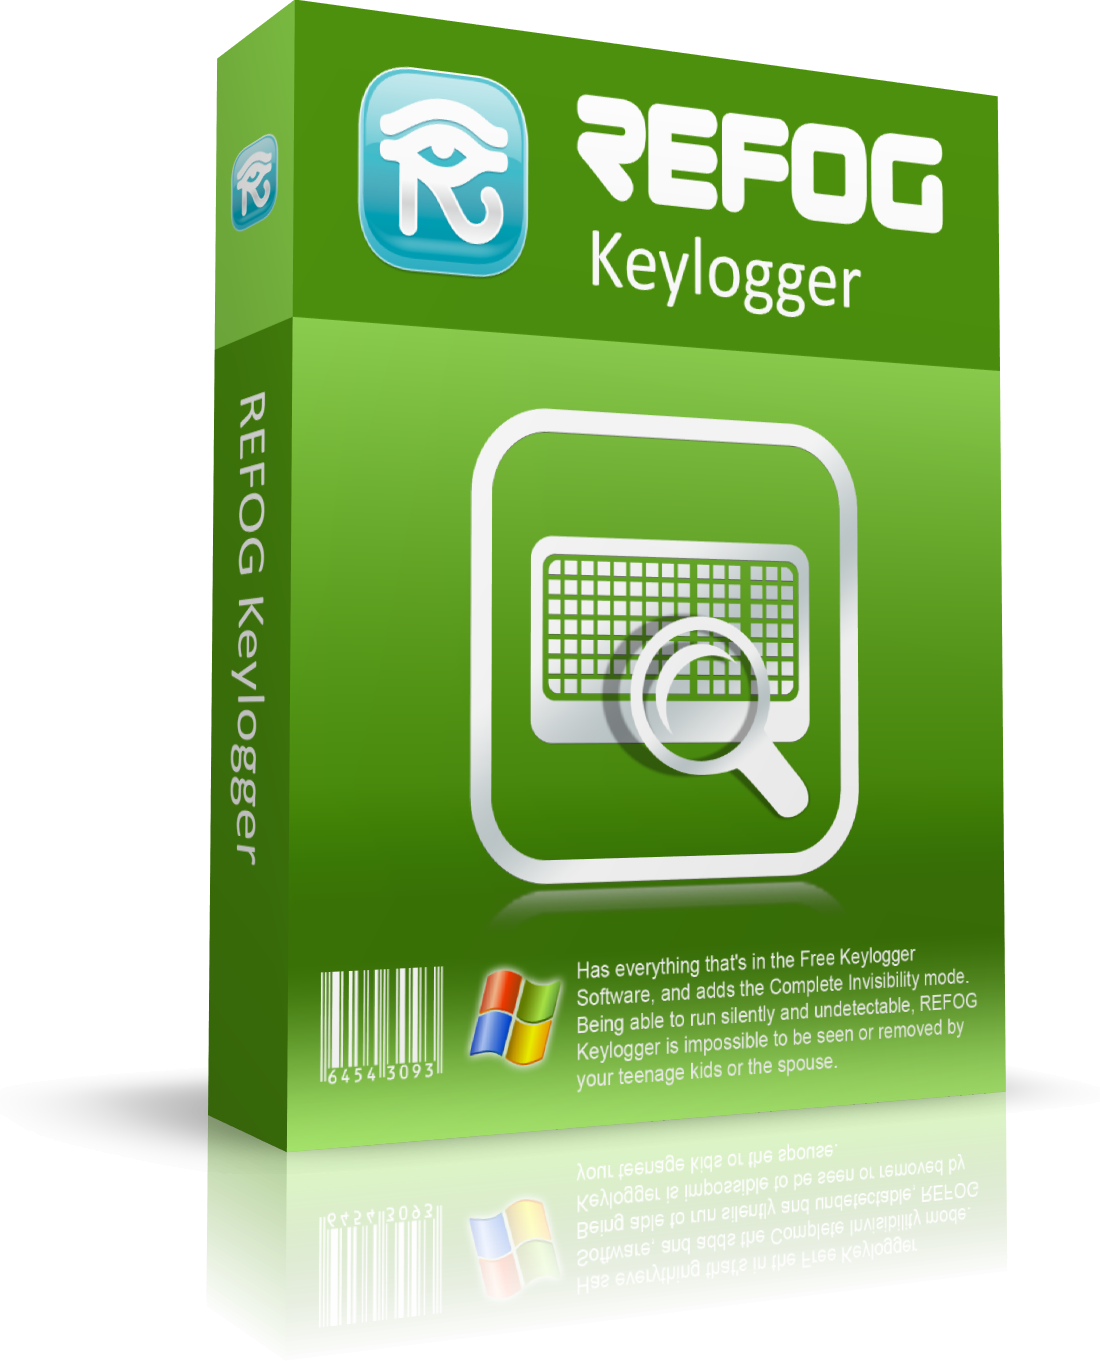 Download refog keylogger 7. 6. 0. 1800 (free) for windows.